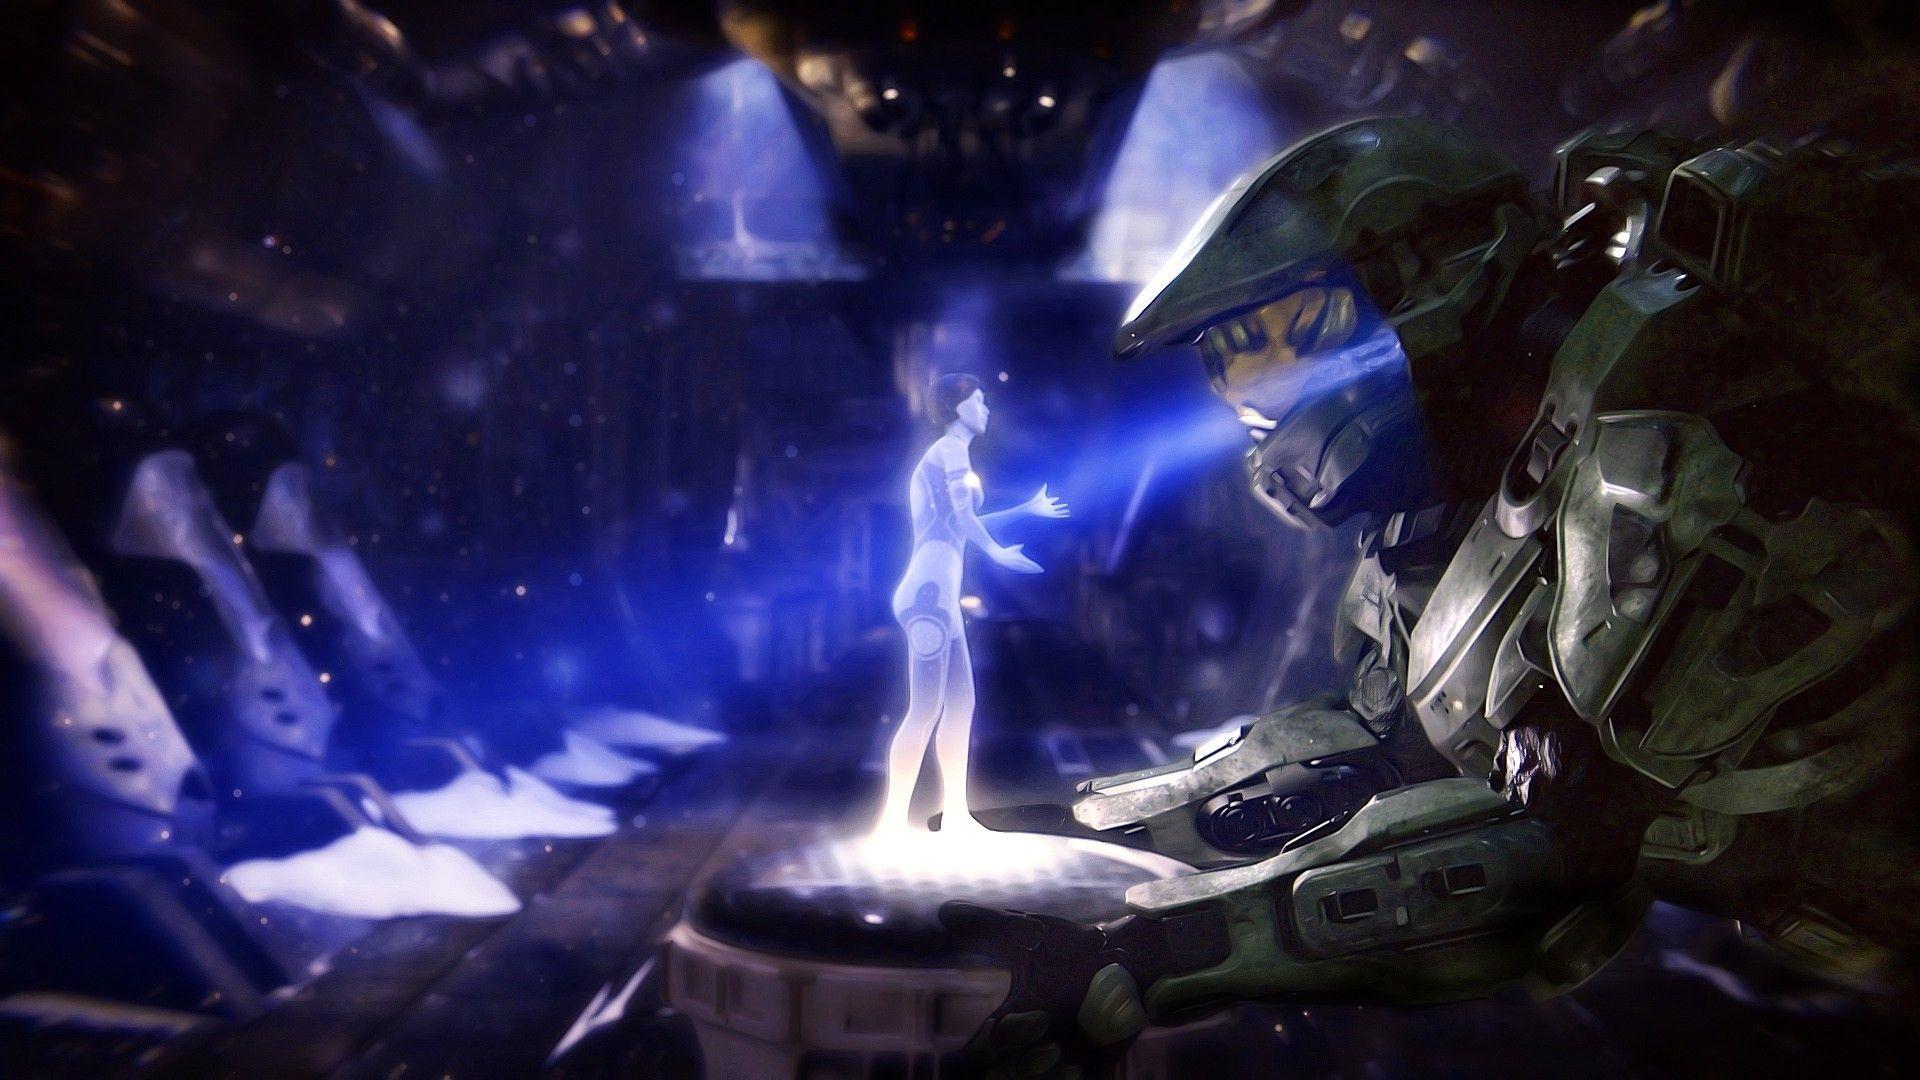 1920x1080 Halo Cortana Wallpaper Halo Master Chief